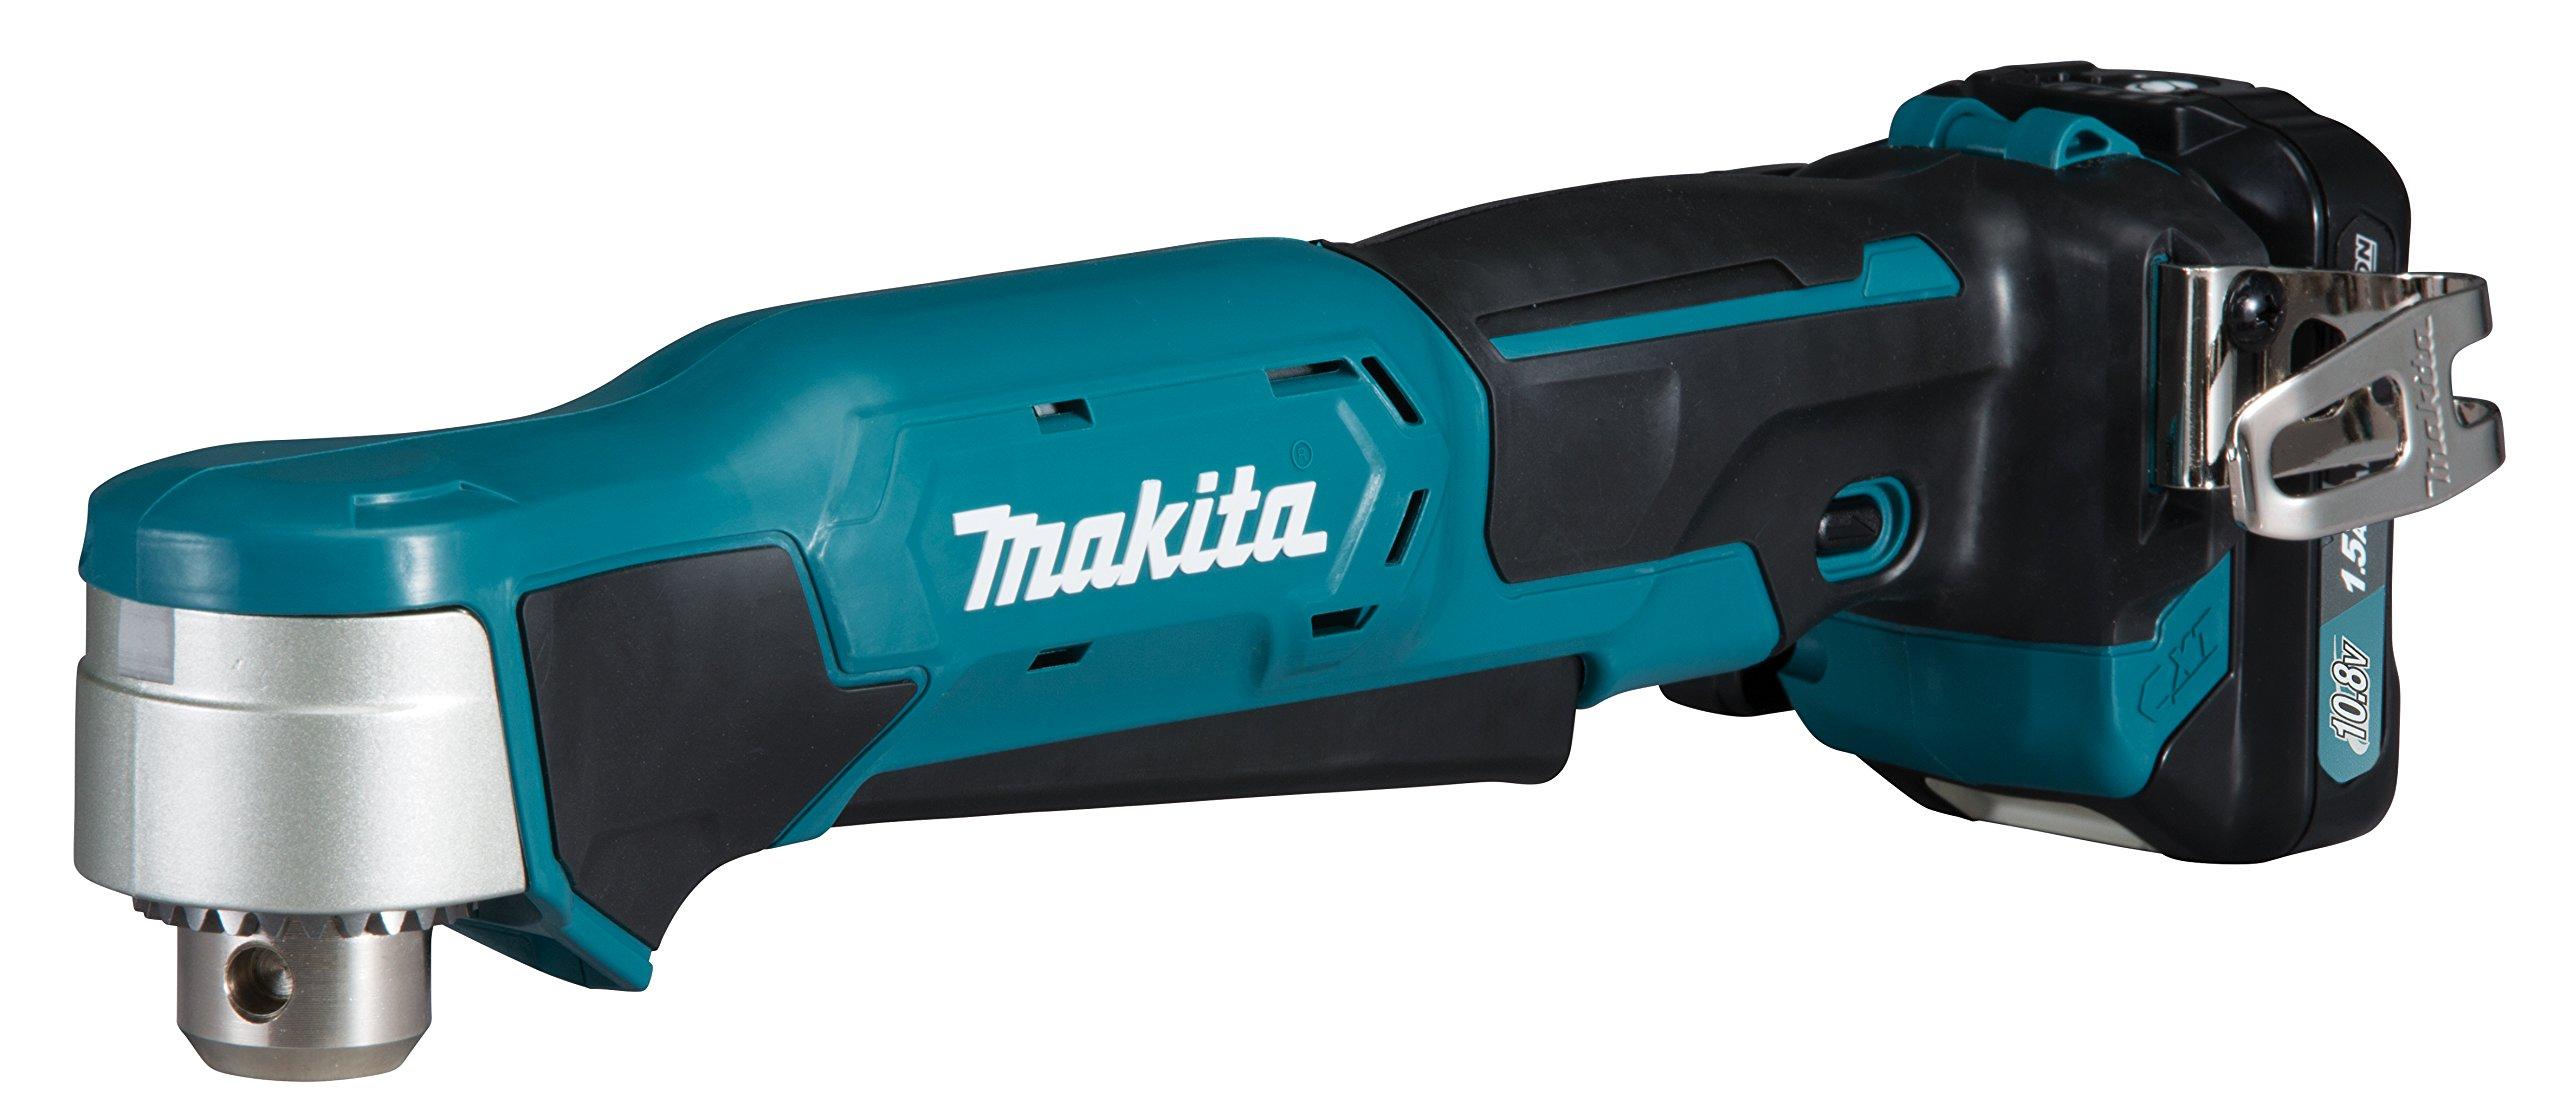 Makita-Akku-Winkelbohrmaschine